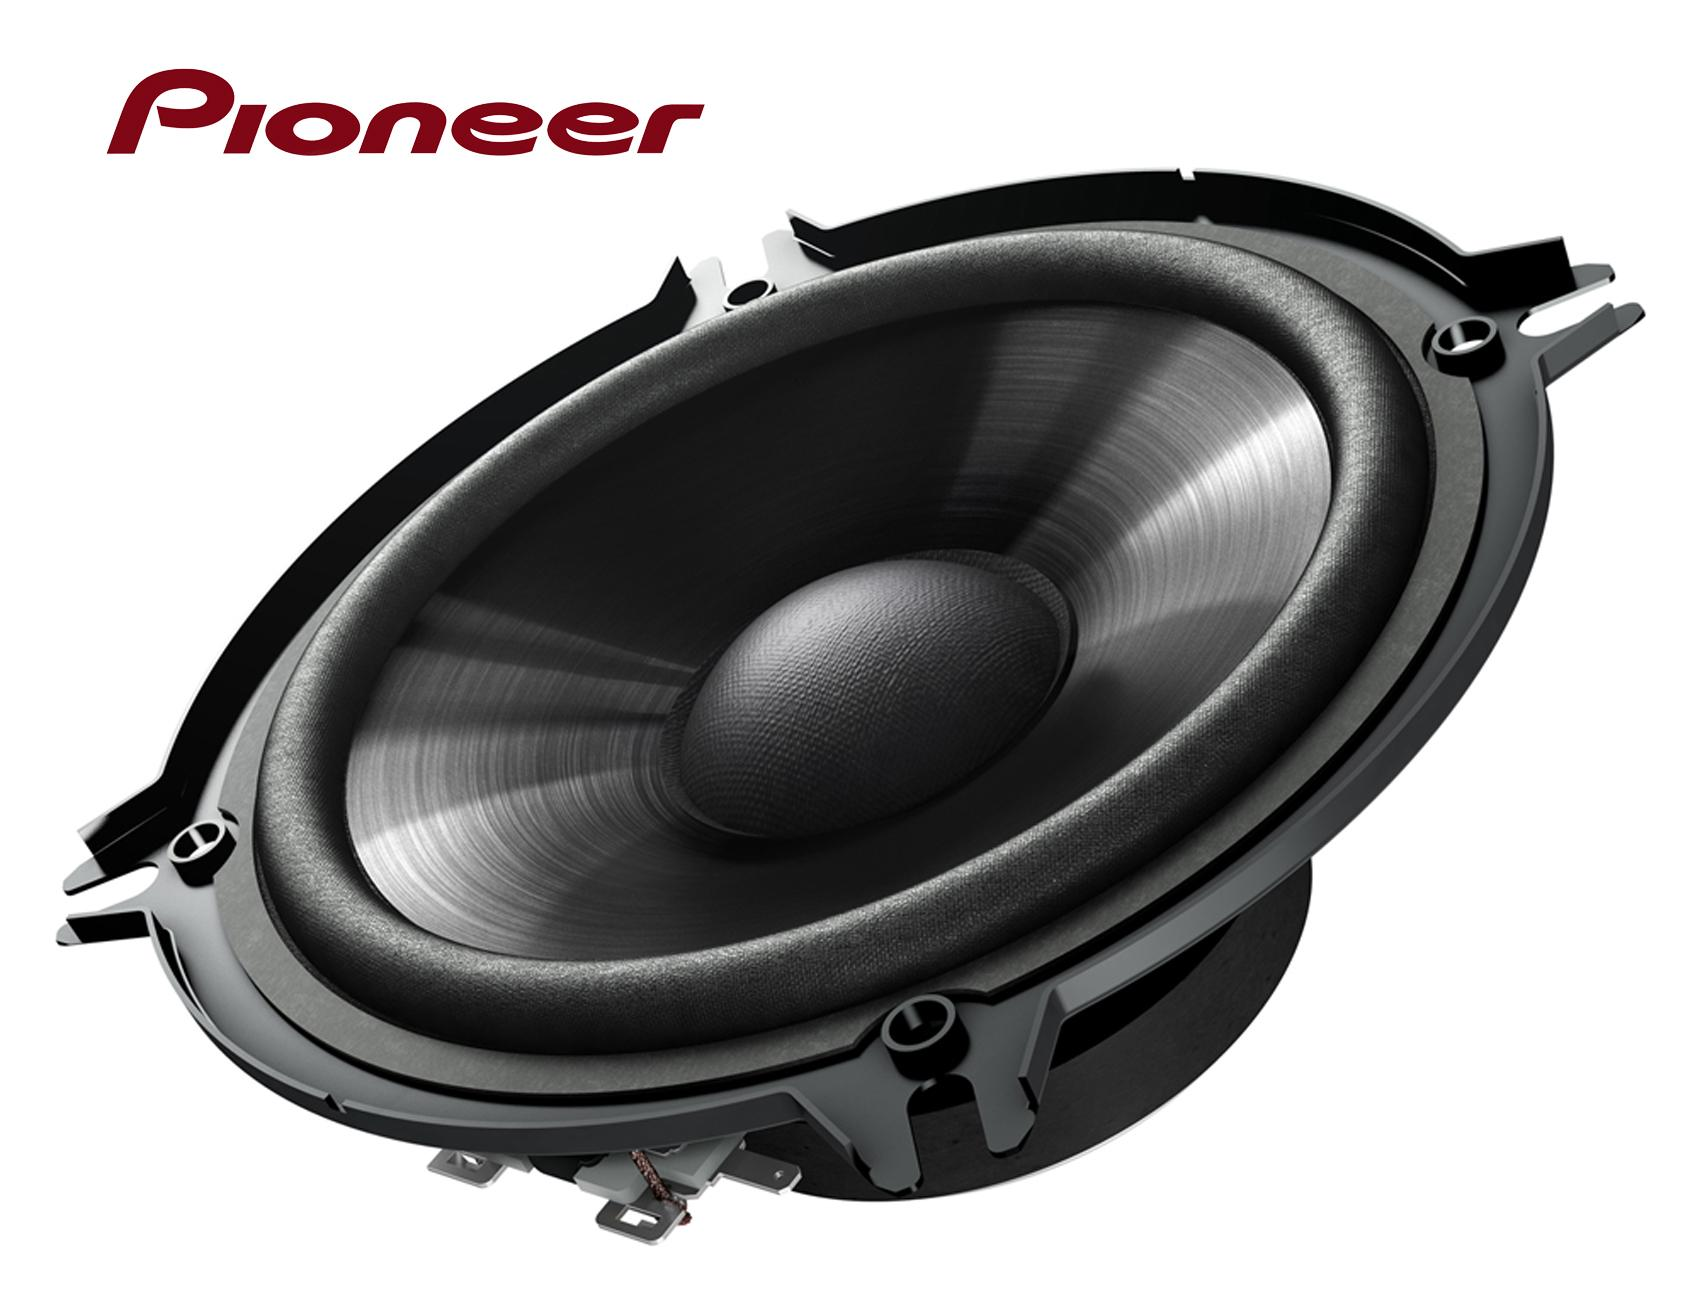 haut parleurs pioneer pioneer ts g133ci 13cm. Black Bedroom Furniture Sets. Home Design Ideas